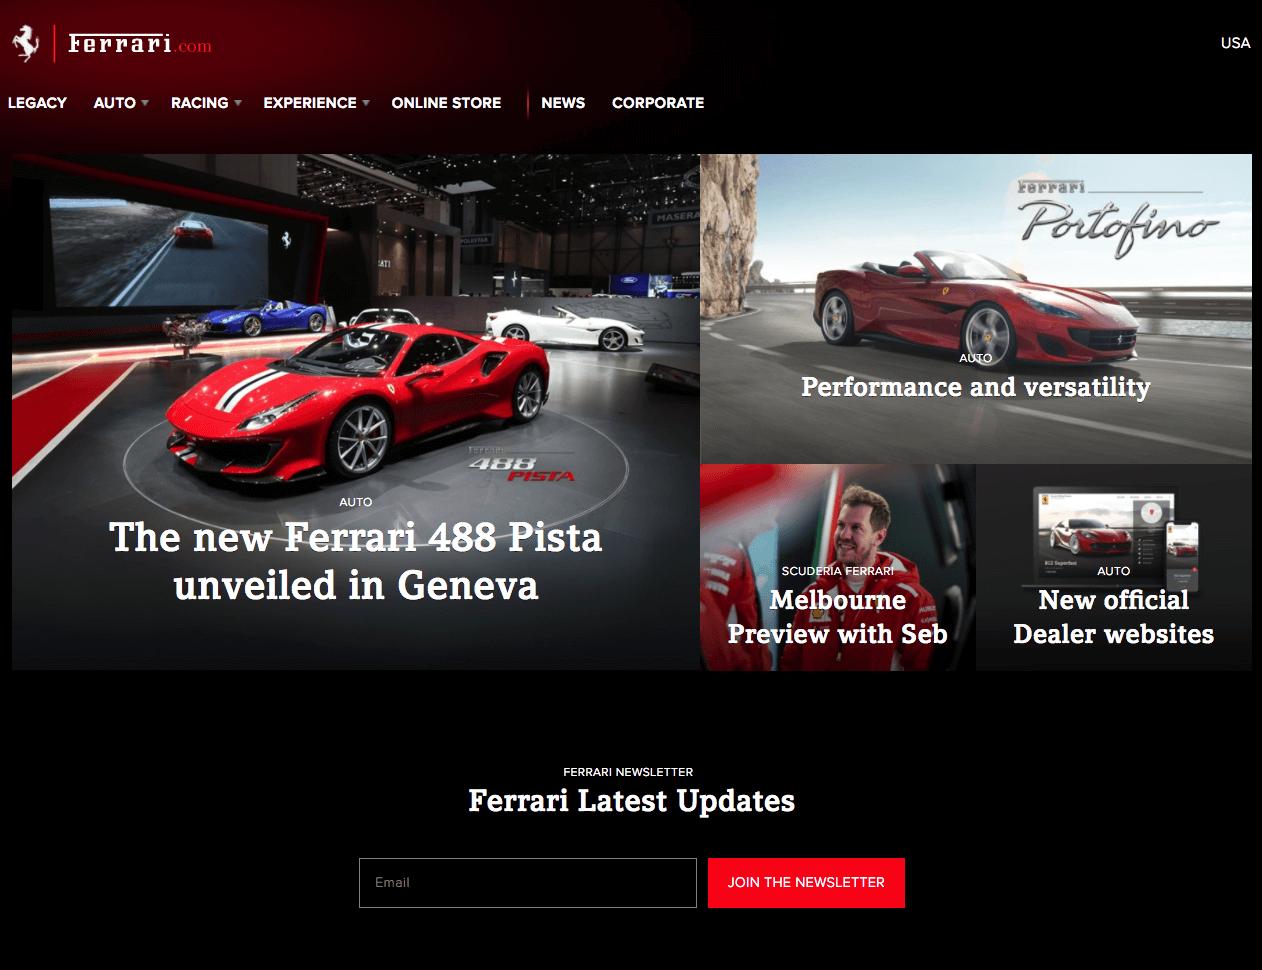 Design-red-color-tone-Official-Ferrari-website